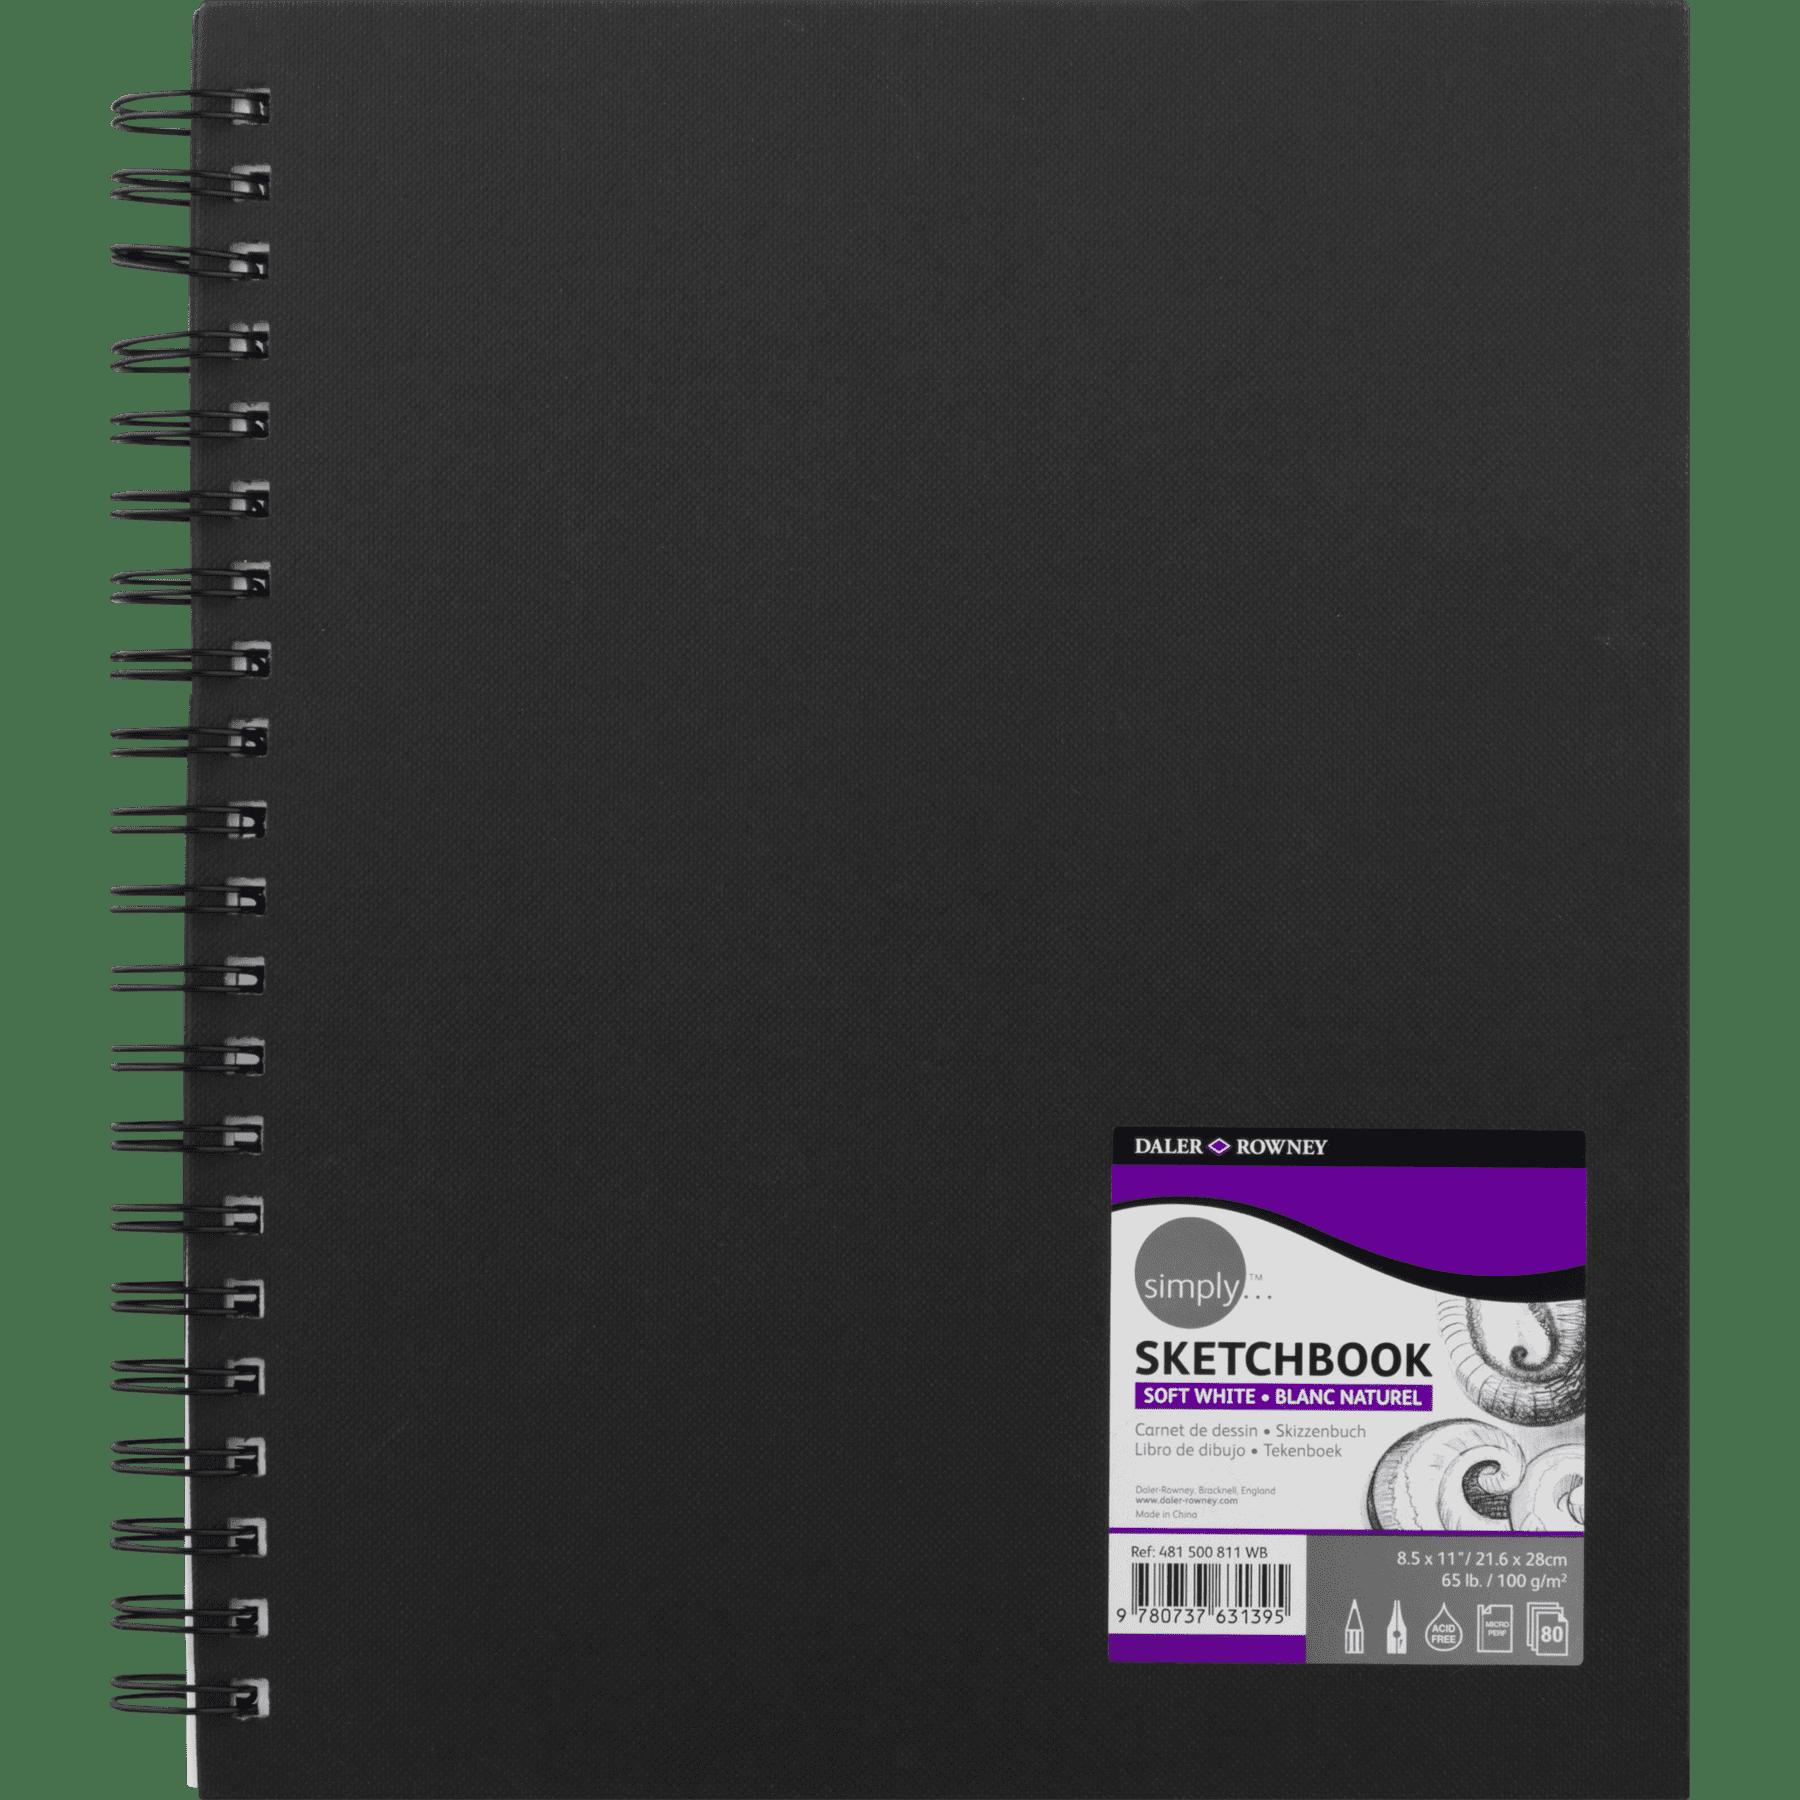 Daler Rowney Simply Wire Bound Sketchbook 8 5 X 11 Soft White Pages 65 Lb 80 Sheet Walmart Com Walmart Com